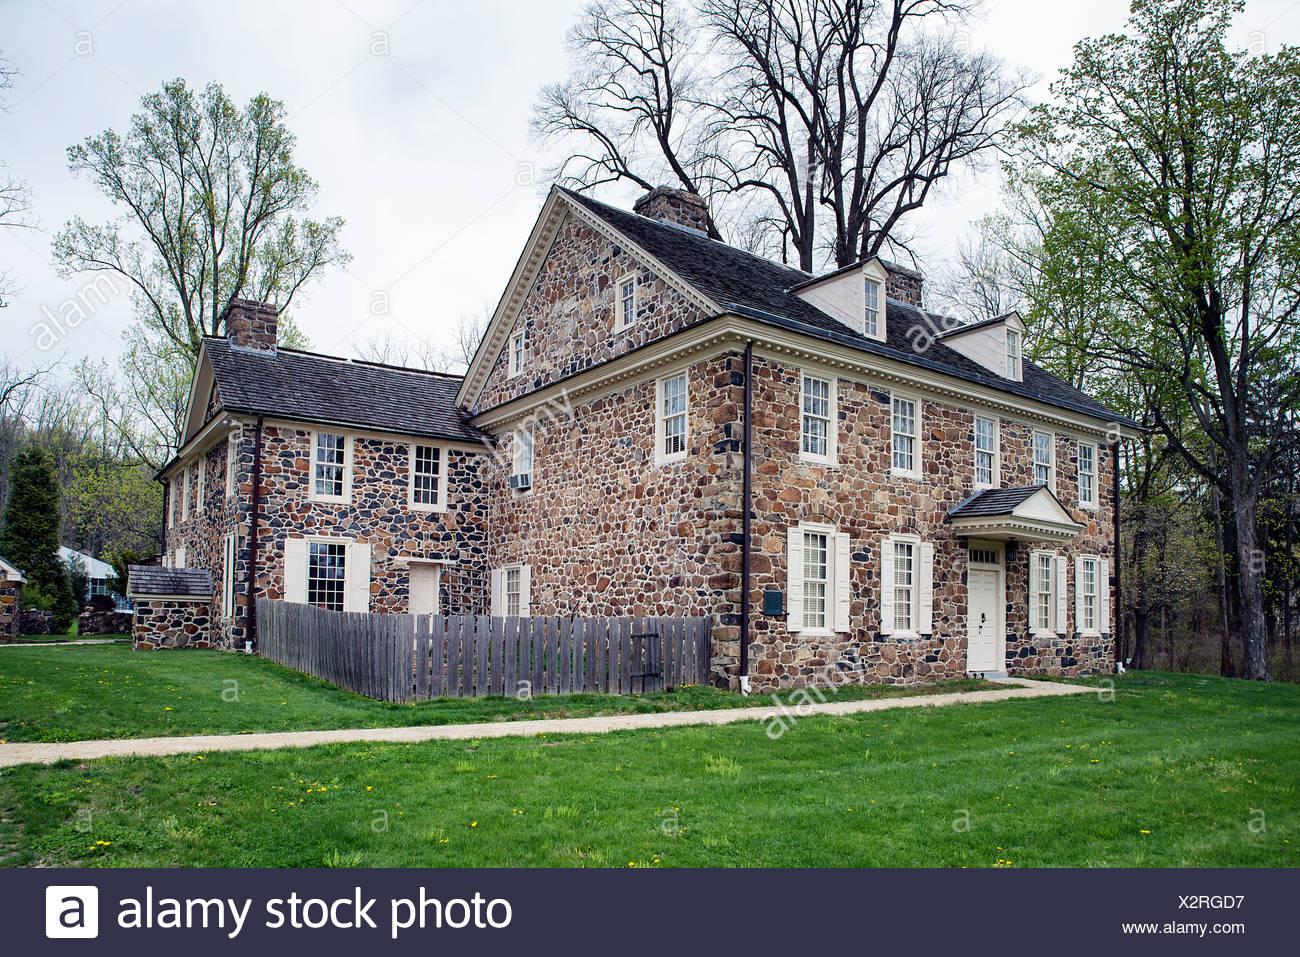 Historic Waynesboro, home of Major General Anthony Wayne, 1745-1796, Paoli, Pennsylvania, PA, USA - Stock Image